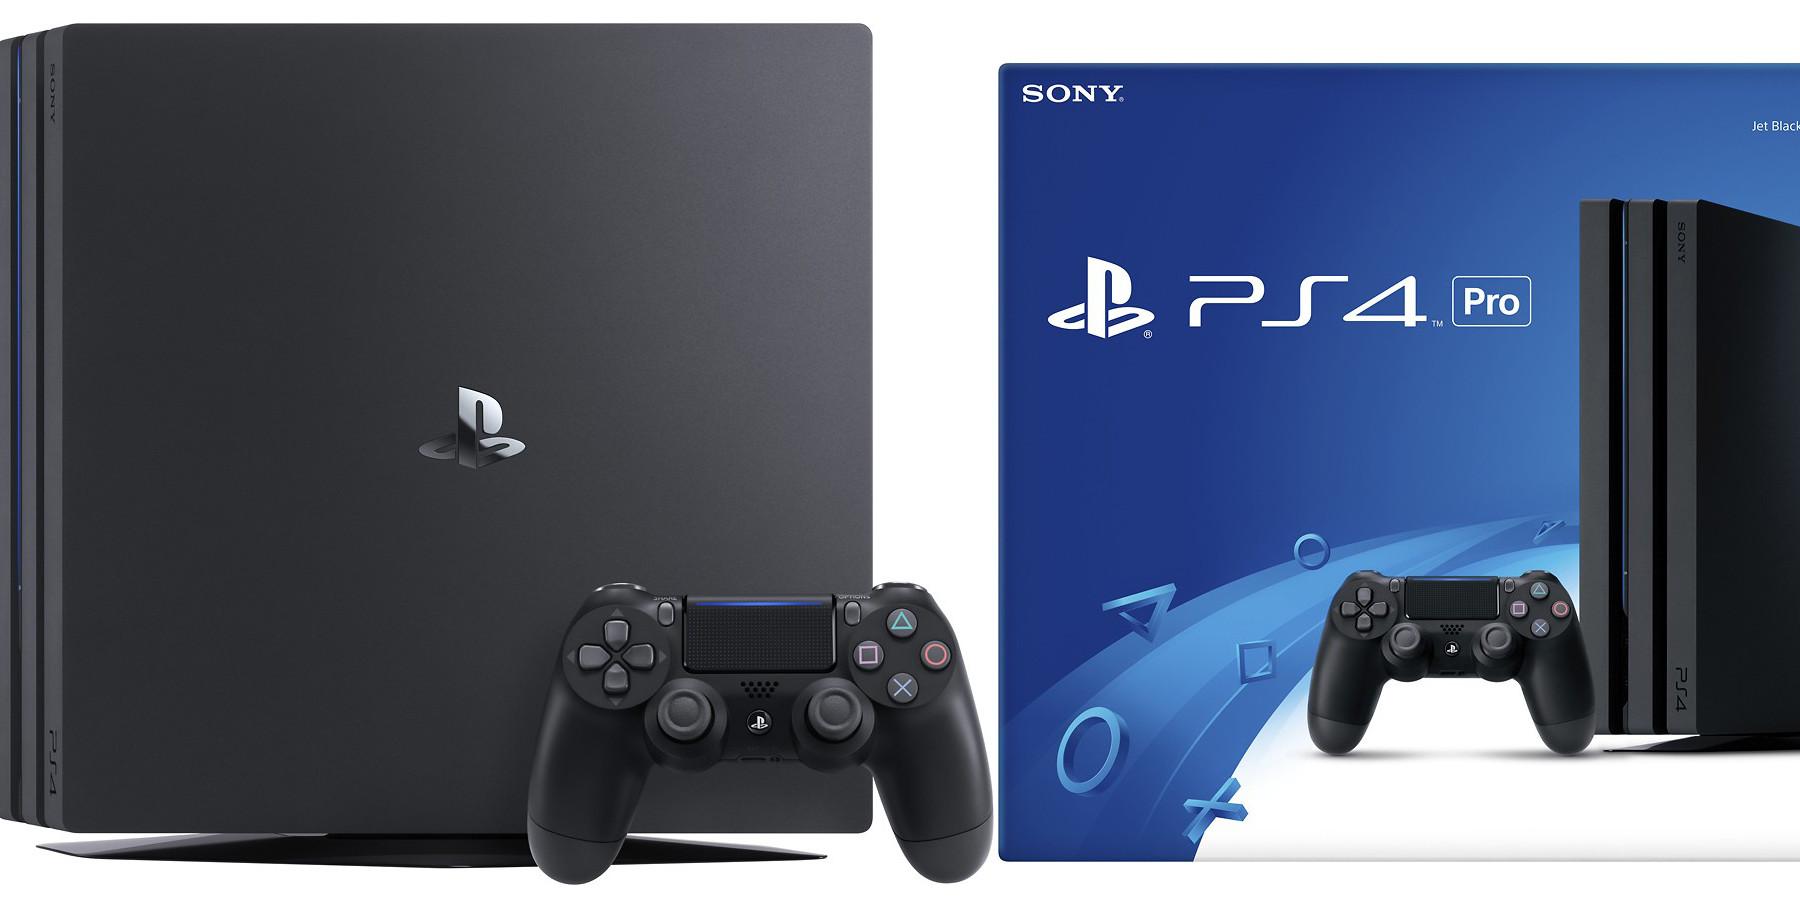 Playstation 4 Pro + Destiny 2 & Overwatch GOTY for $400 shipped ($470+ value)